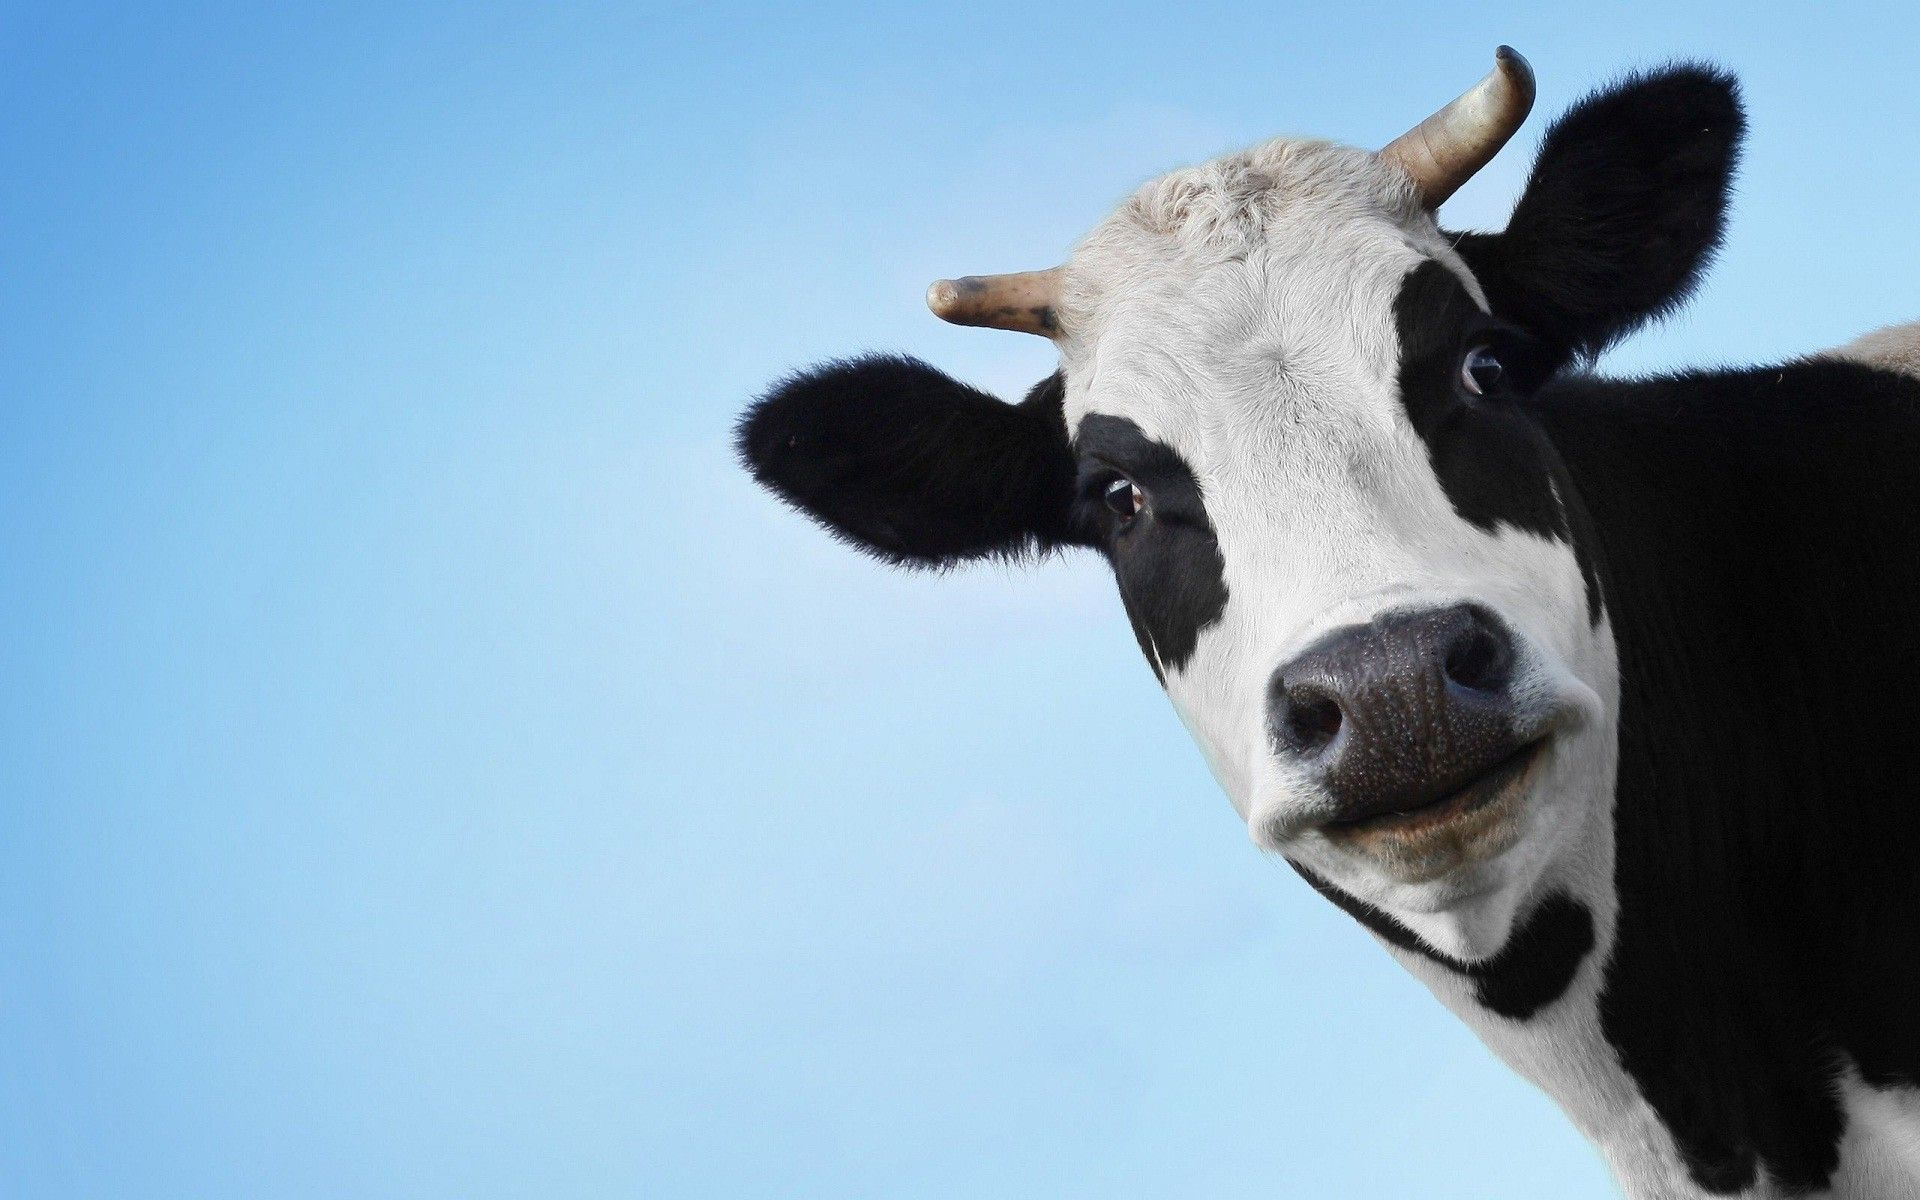 The Cow Jones